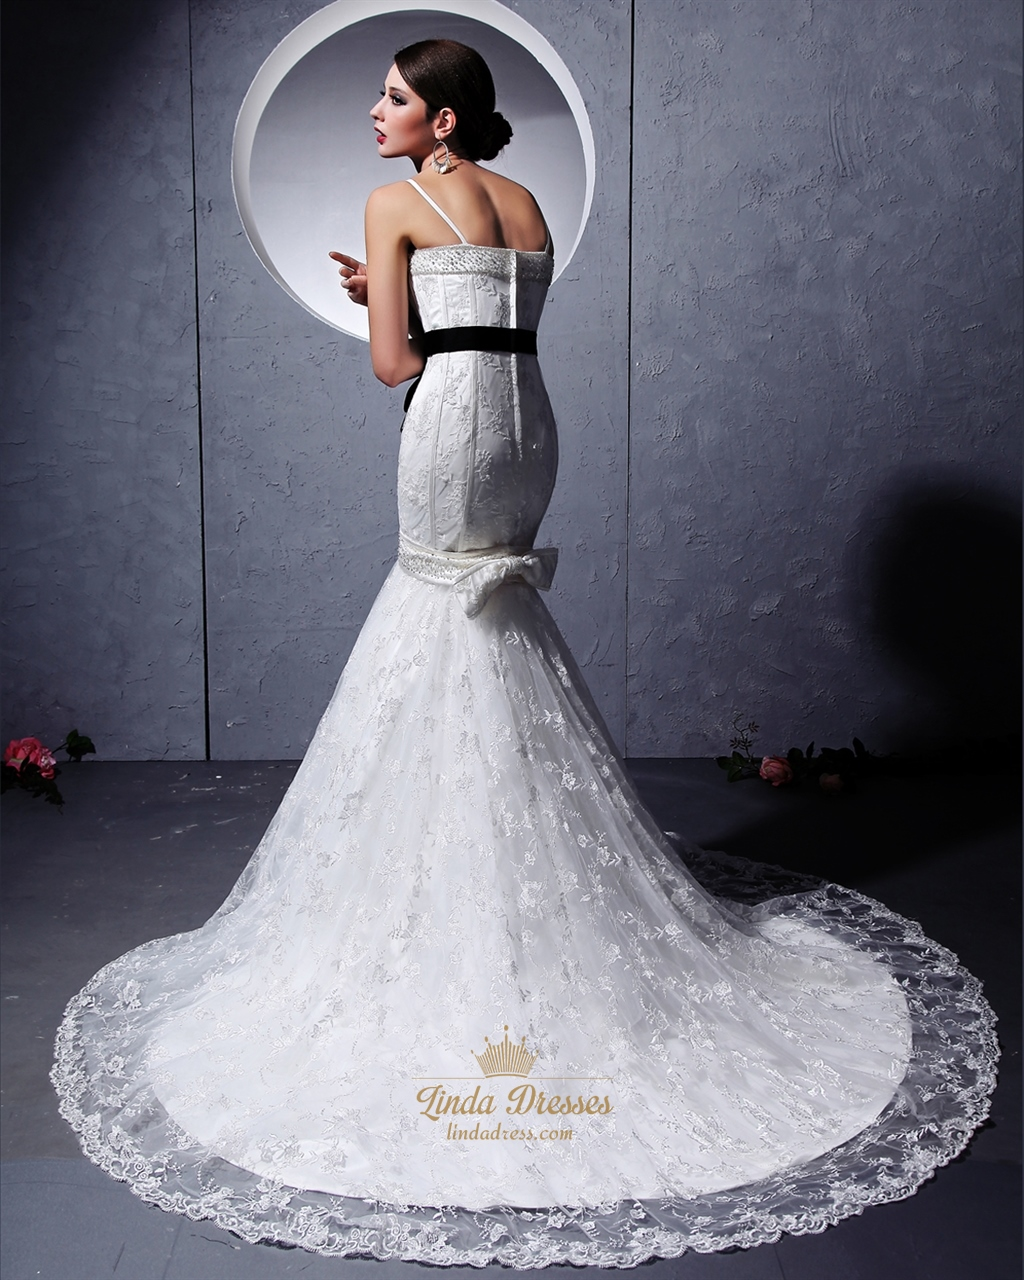 Black Mermaid Wedding Dresses: White Mermaid Beaded Spaghetti Strap Wedding Dresses With